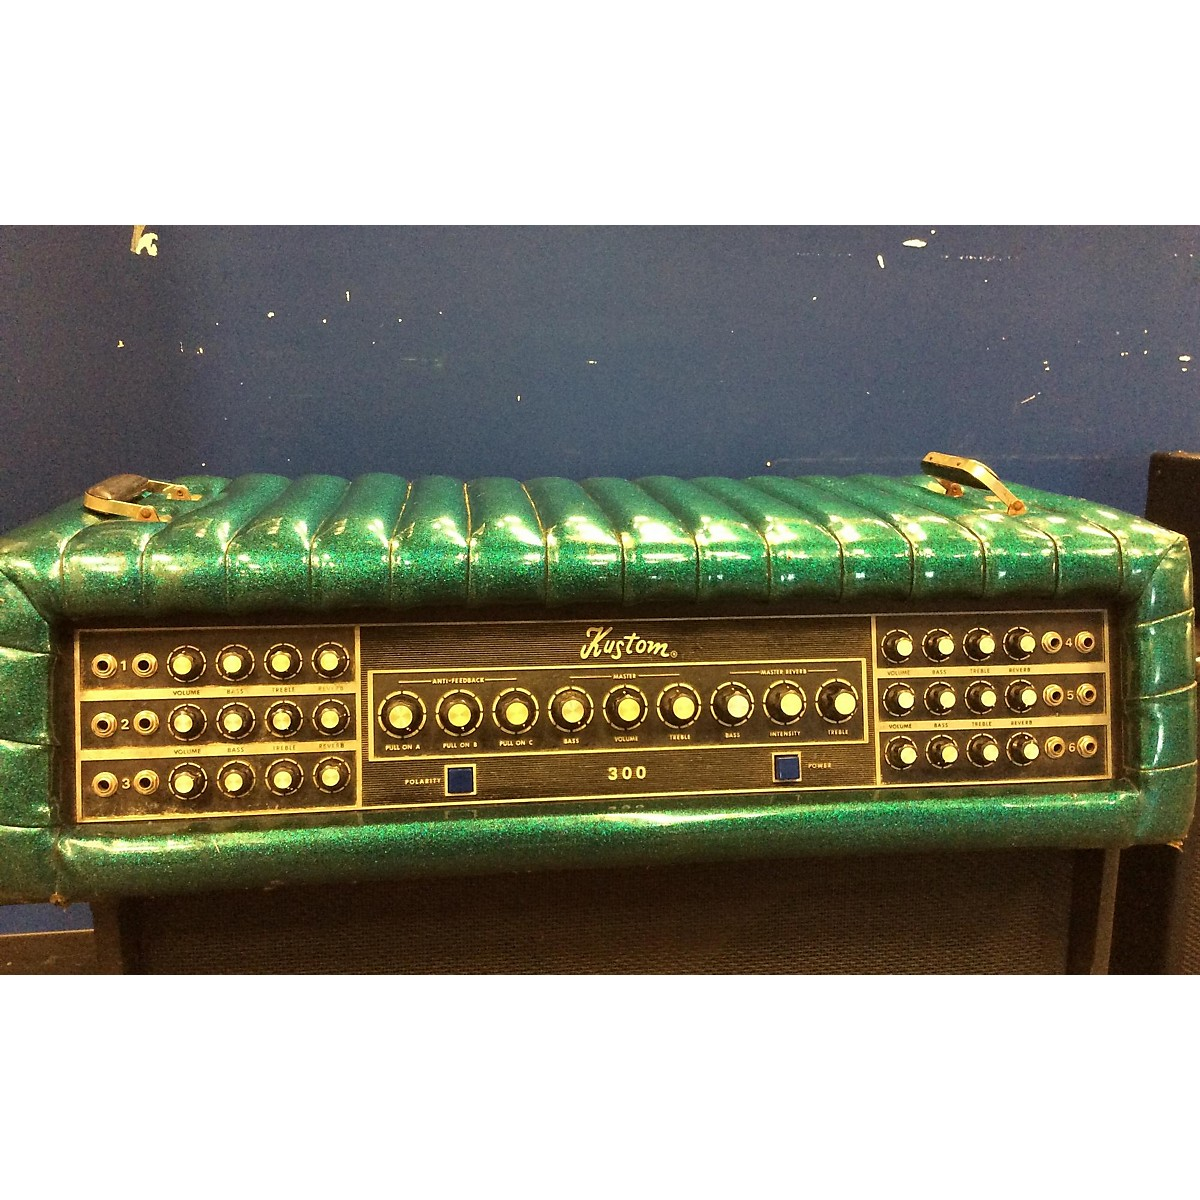 Kustom PA 1970 300 Solid State Guitar Amp Head